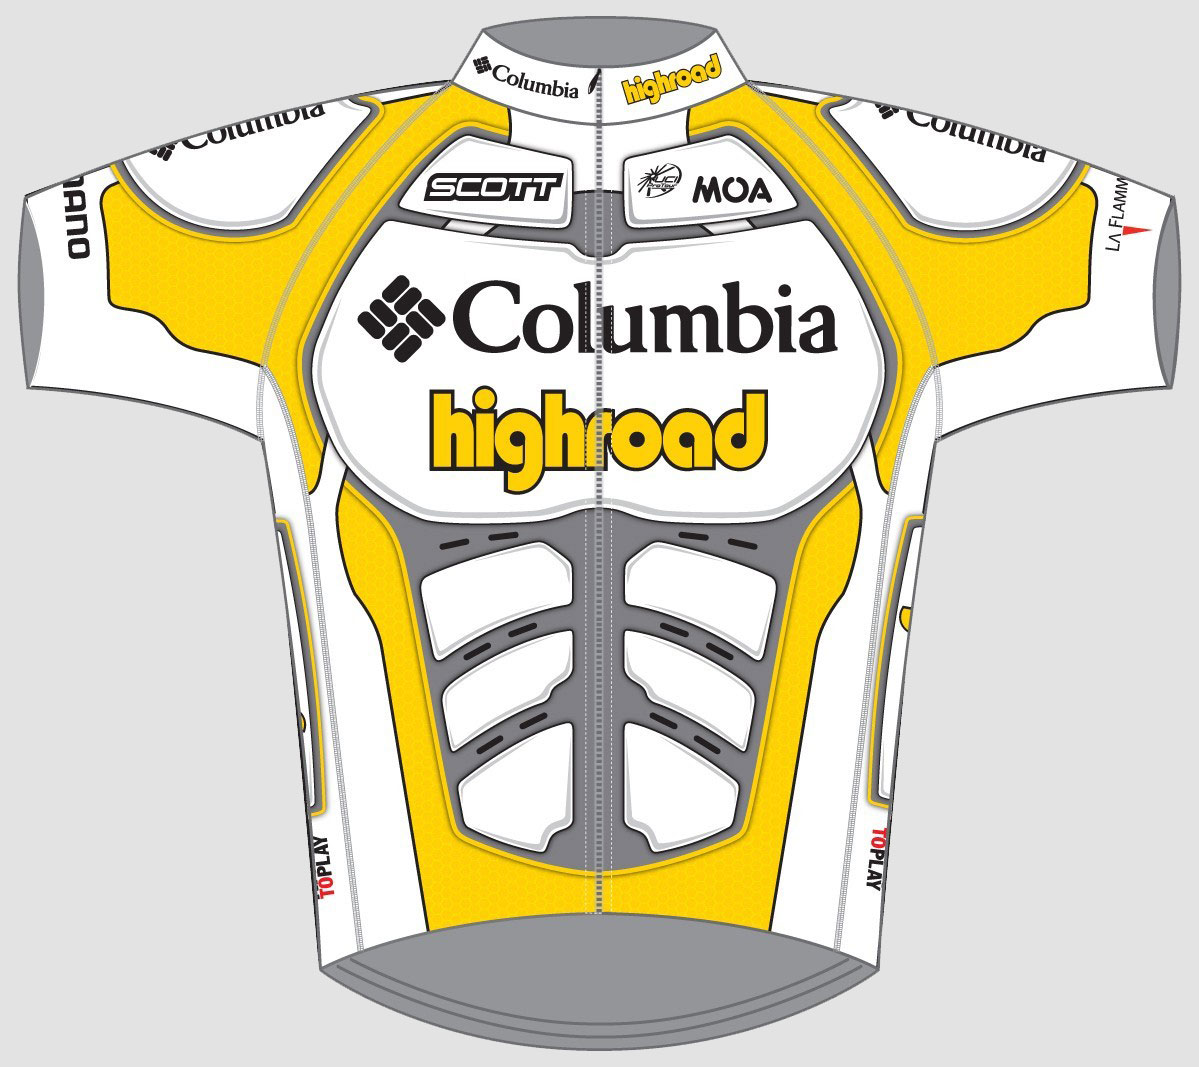 columbia high road